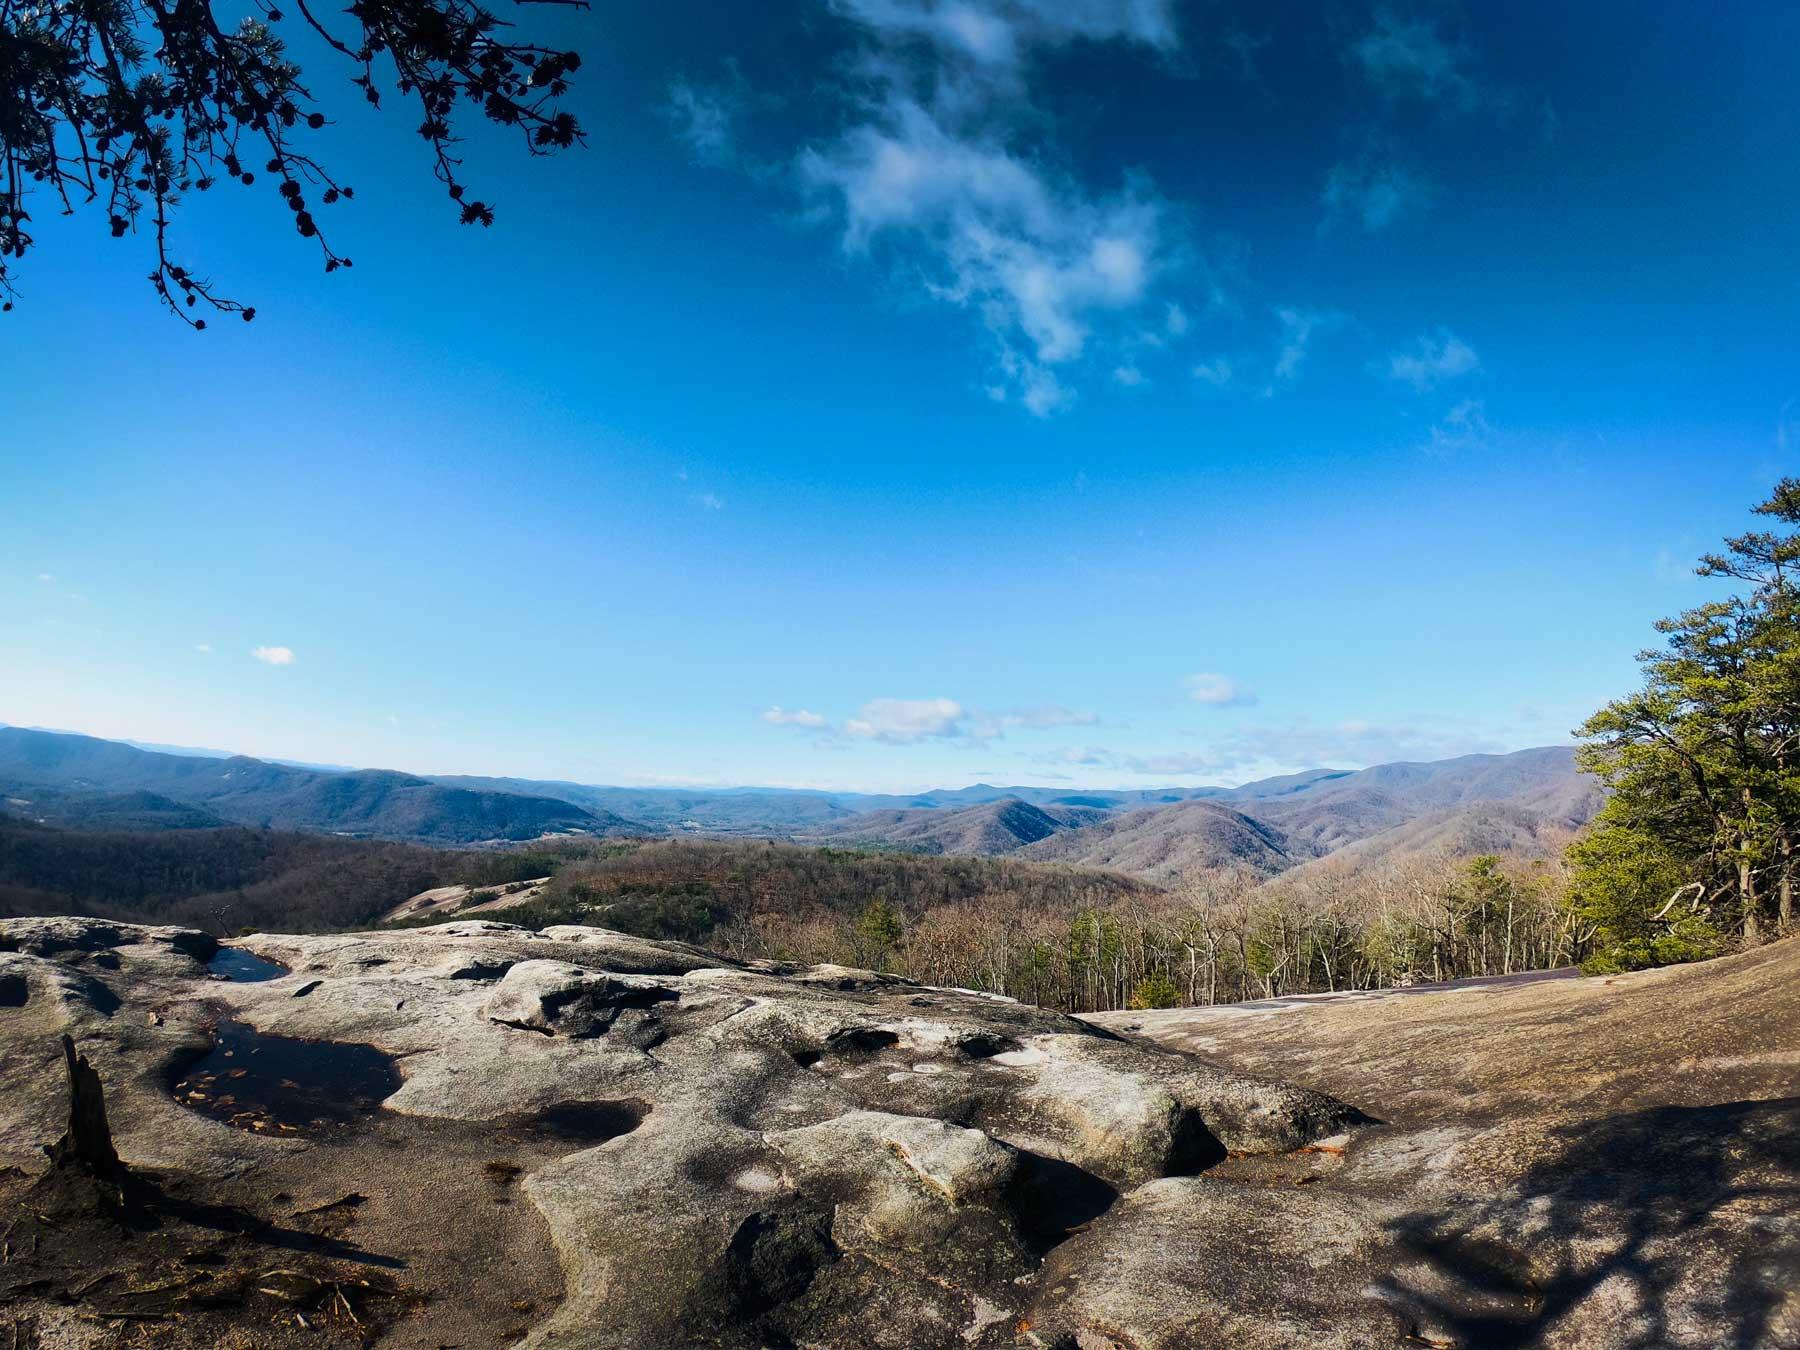 Stone Mountain Trail summit at Stone Mountain State Park, North Carolina